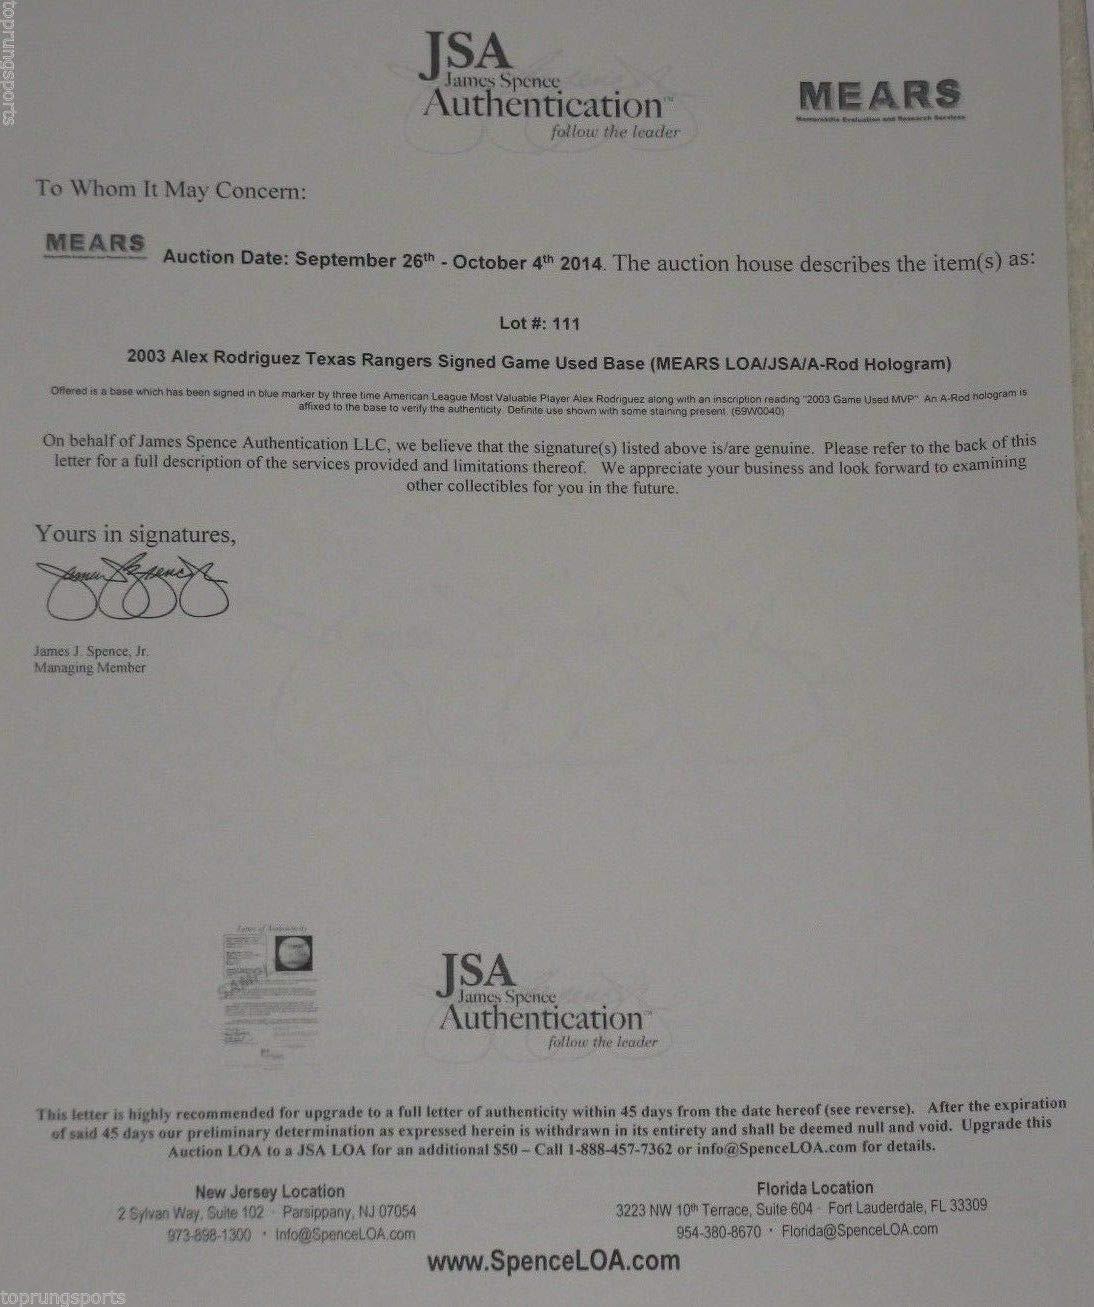 Alex Rodriguez Autographed Signed 2003 Rangers Game Used Base JSA Mears Coa